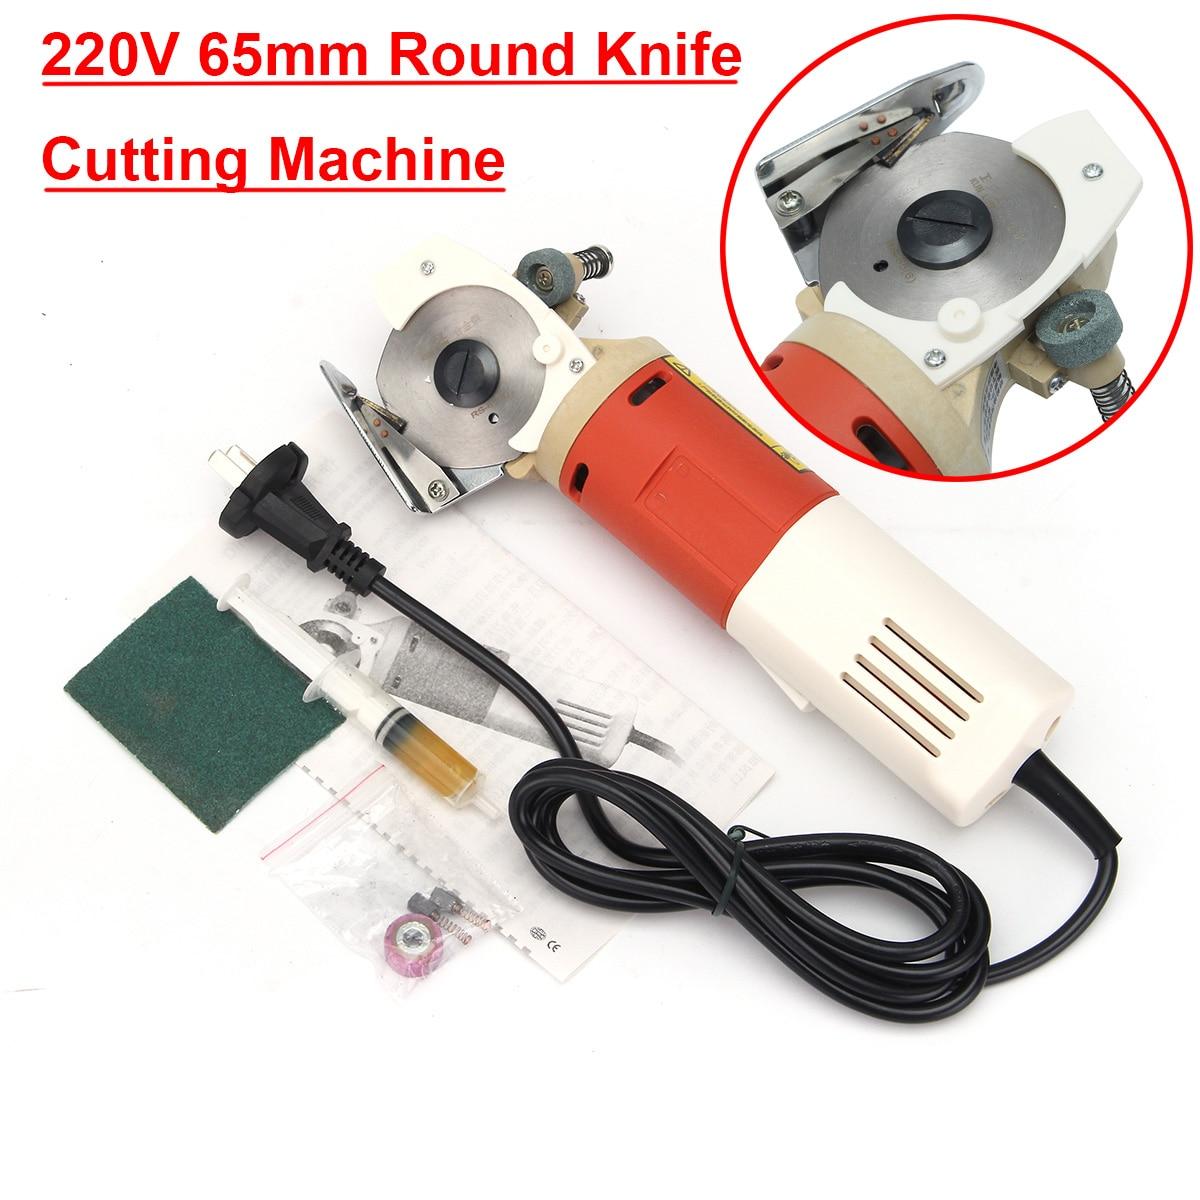 65mm Rotary Blade Electric Round Knife Cloth Cutter Fabric Cutting Machine 220V AC 150W